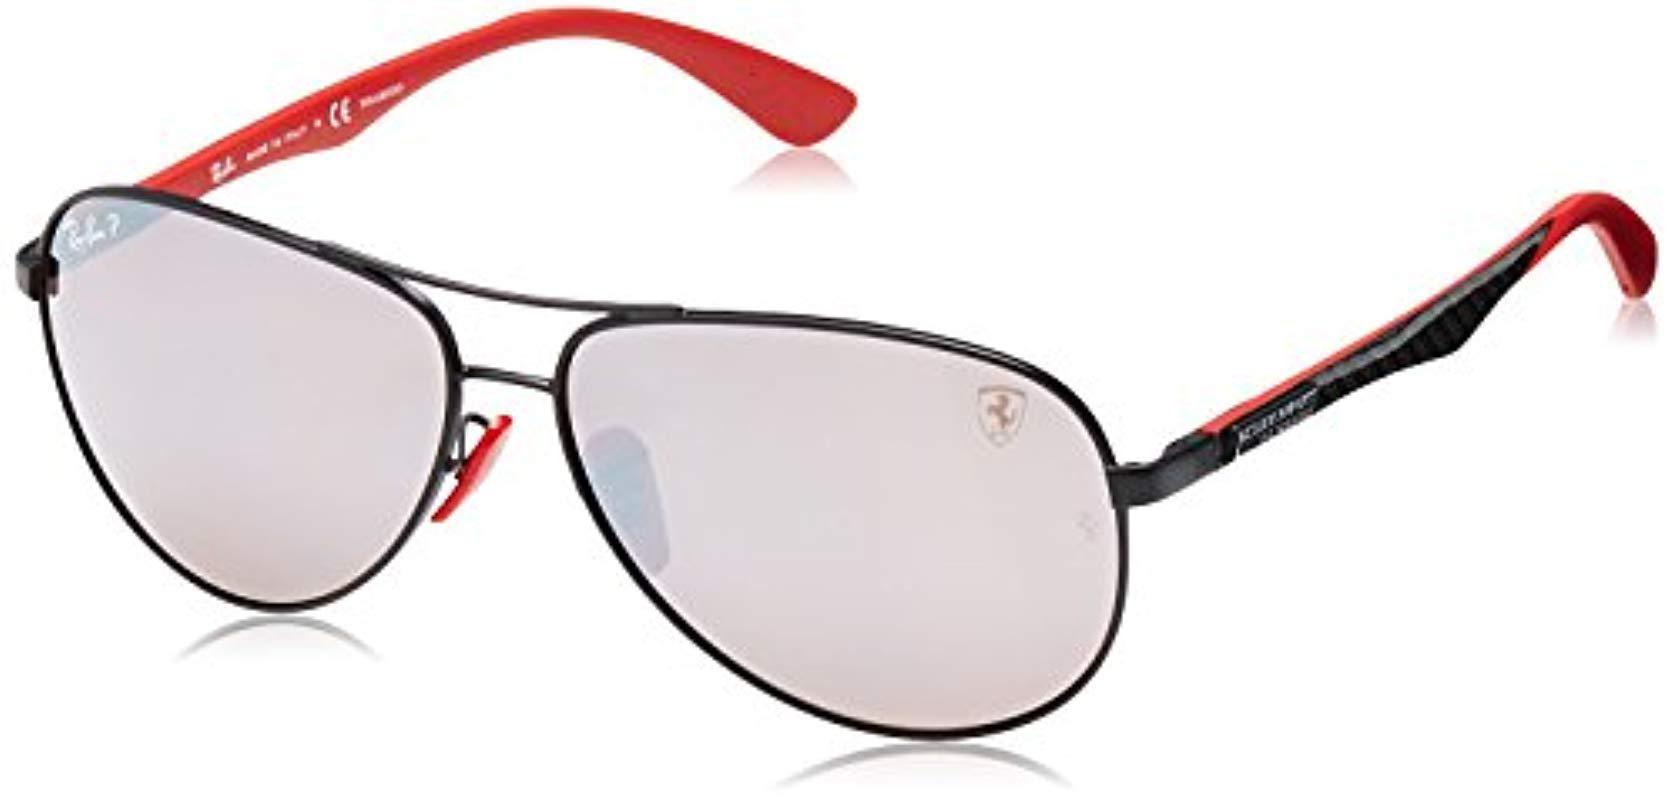 4592073eea4 ... hot ray ban. mens black rb8313m scuderia ferrari collection polarized  sunglasses cc1a2 14176